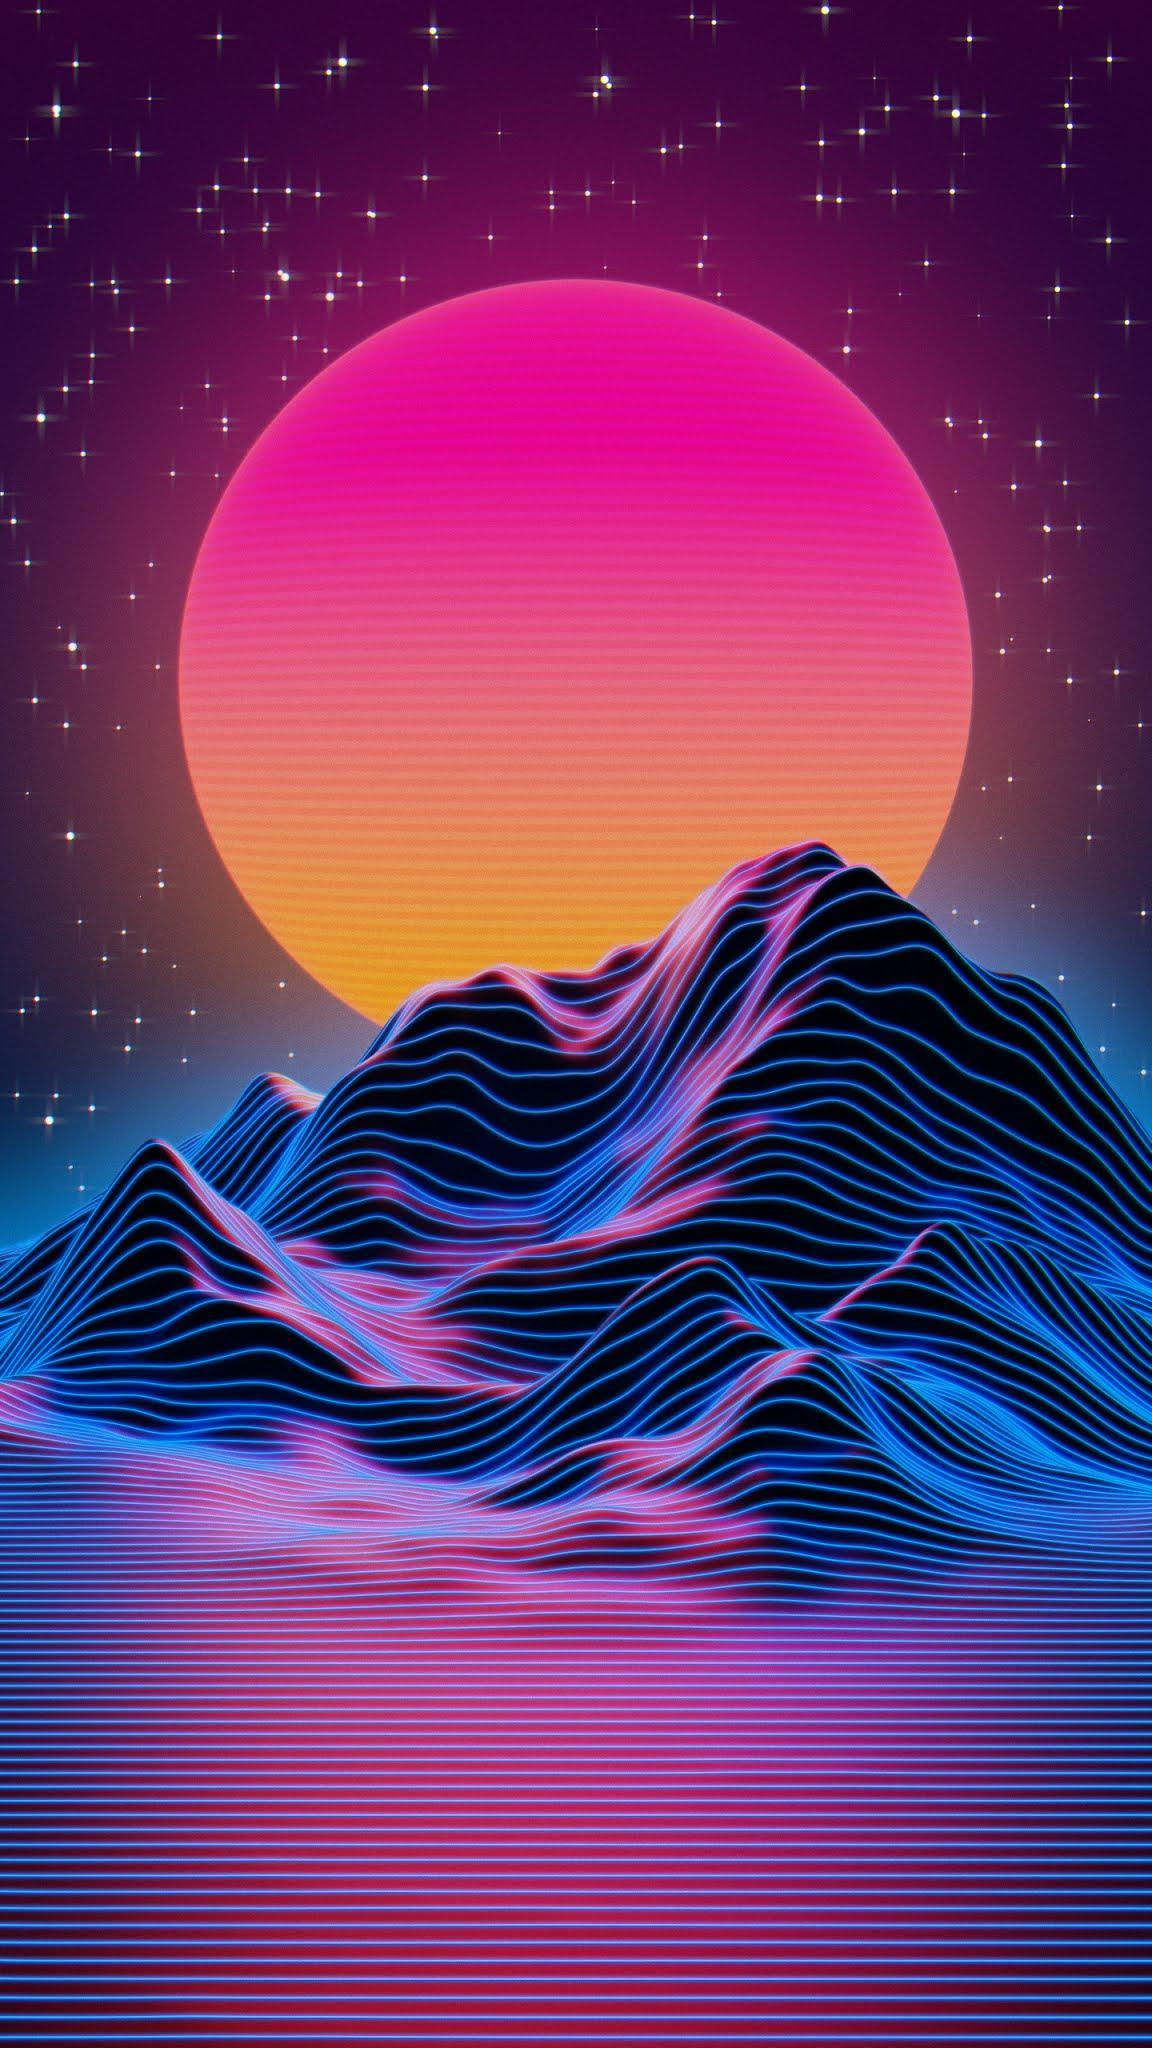 Mobile Vaporwave Wallpapers - Wallpaper Cave